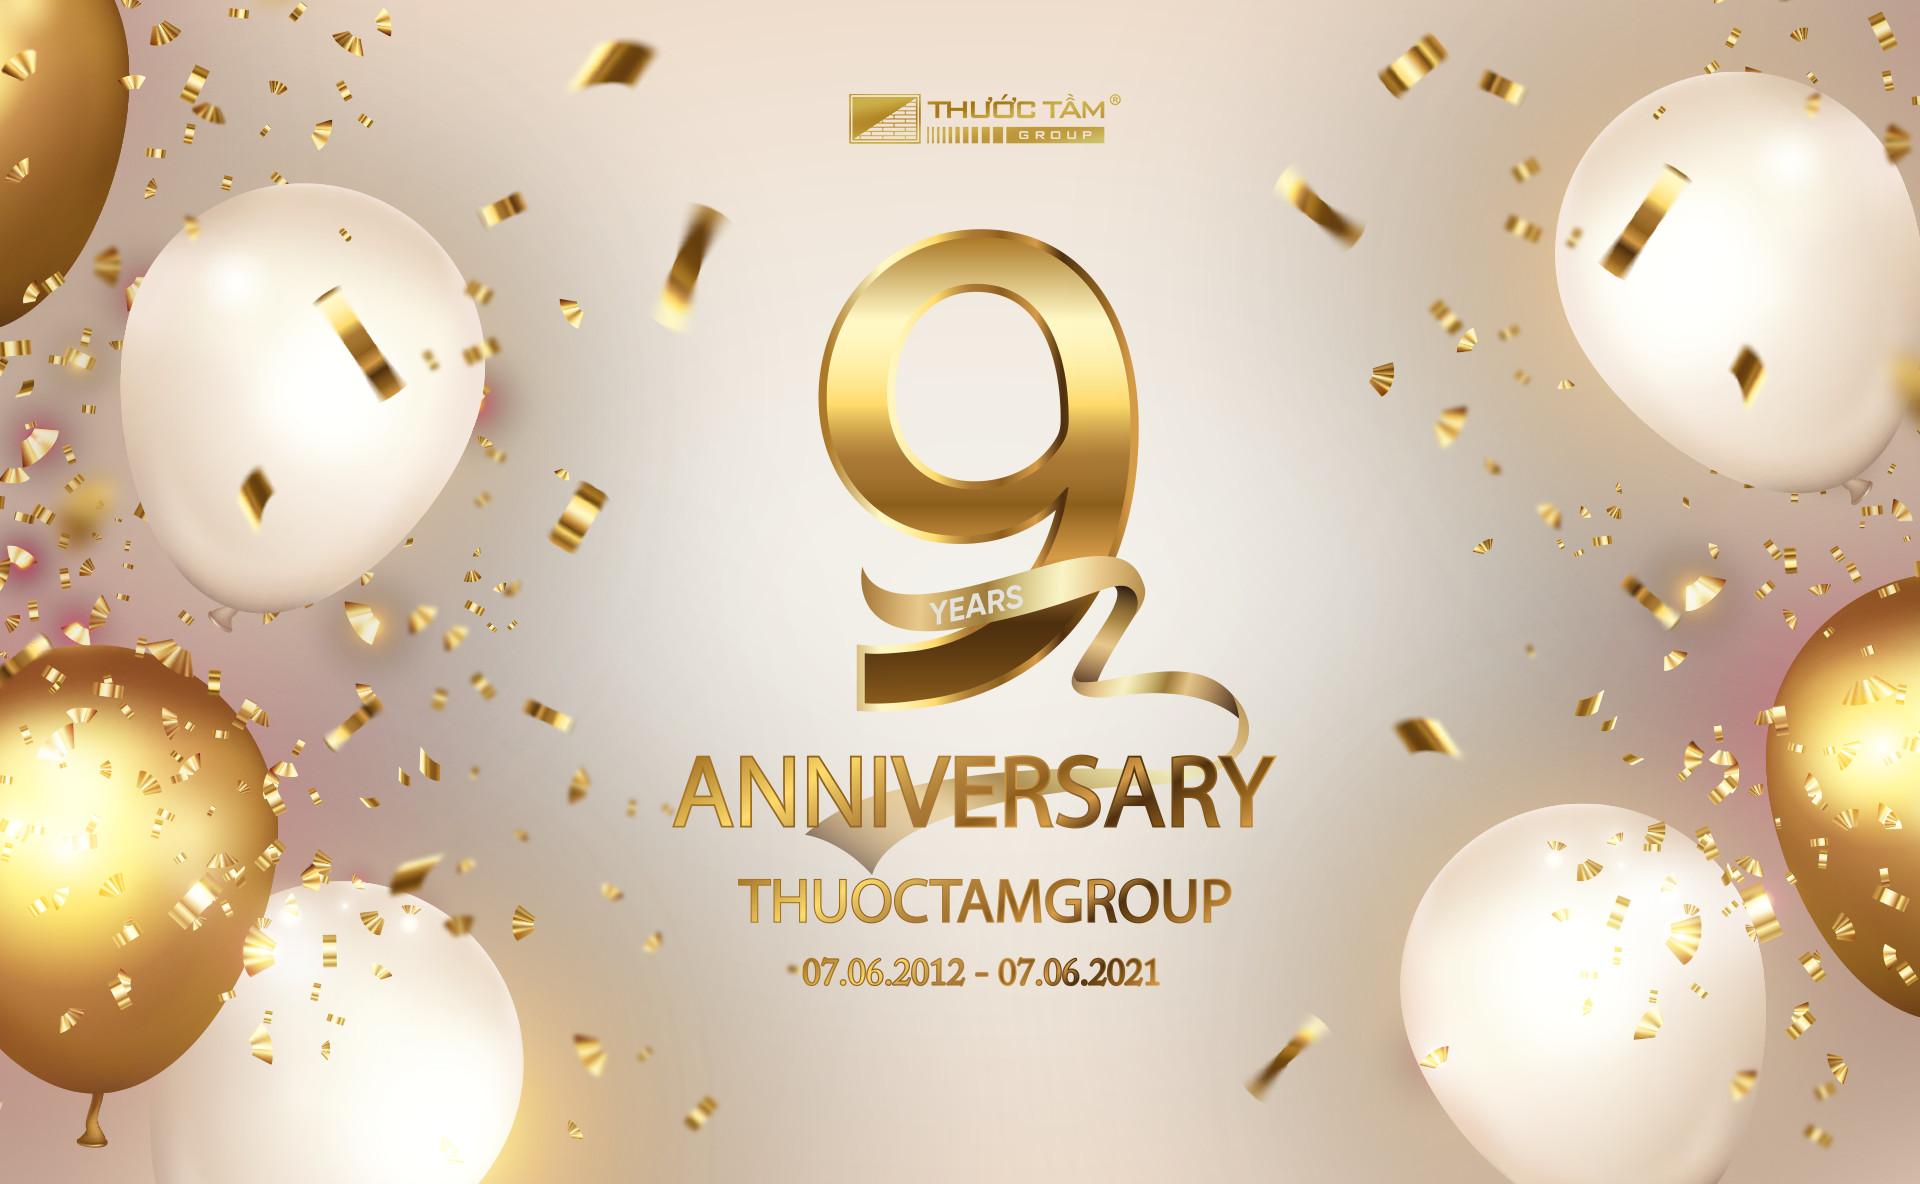 Thuoc Tam Group ky niem 9 nam thanh lap va phat trien